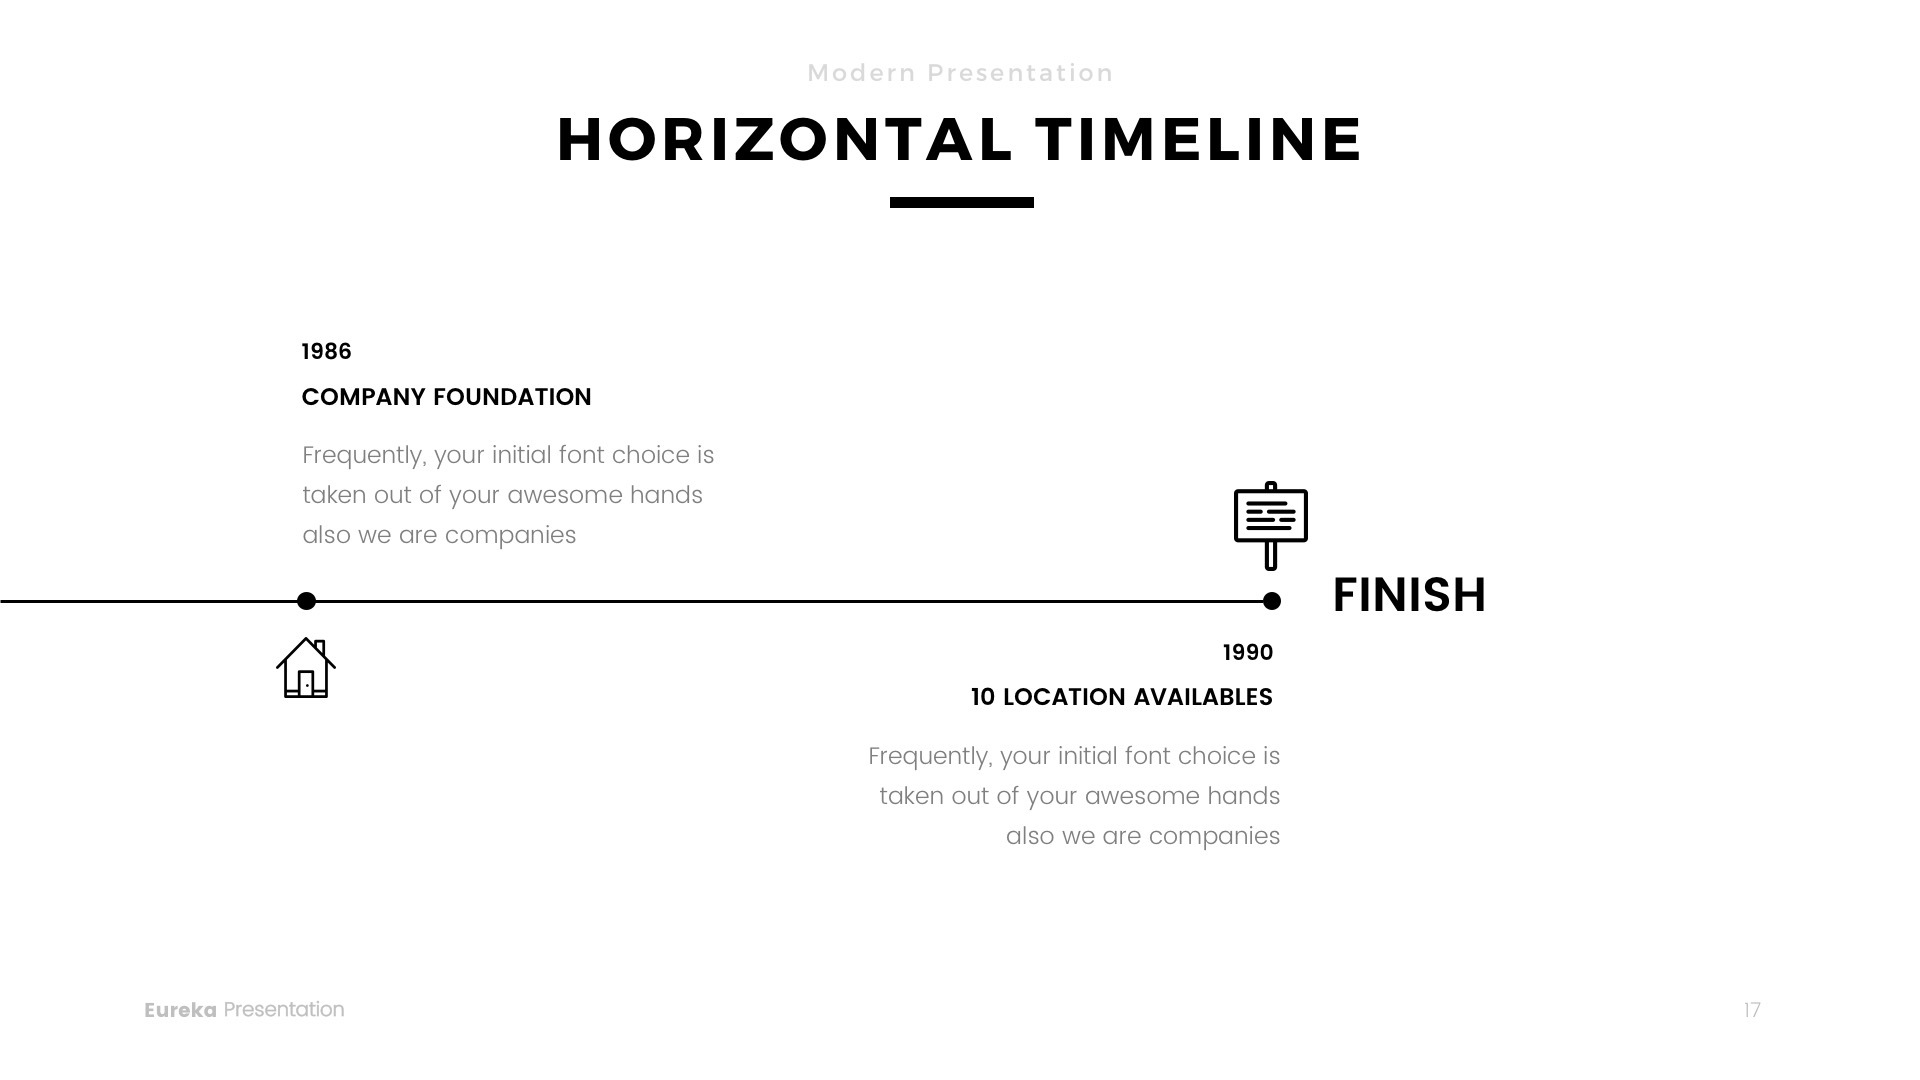 Eureka - Minimal PowerPoint Template by Jetfabrik | GraphicRiver